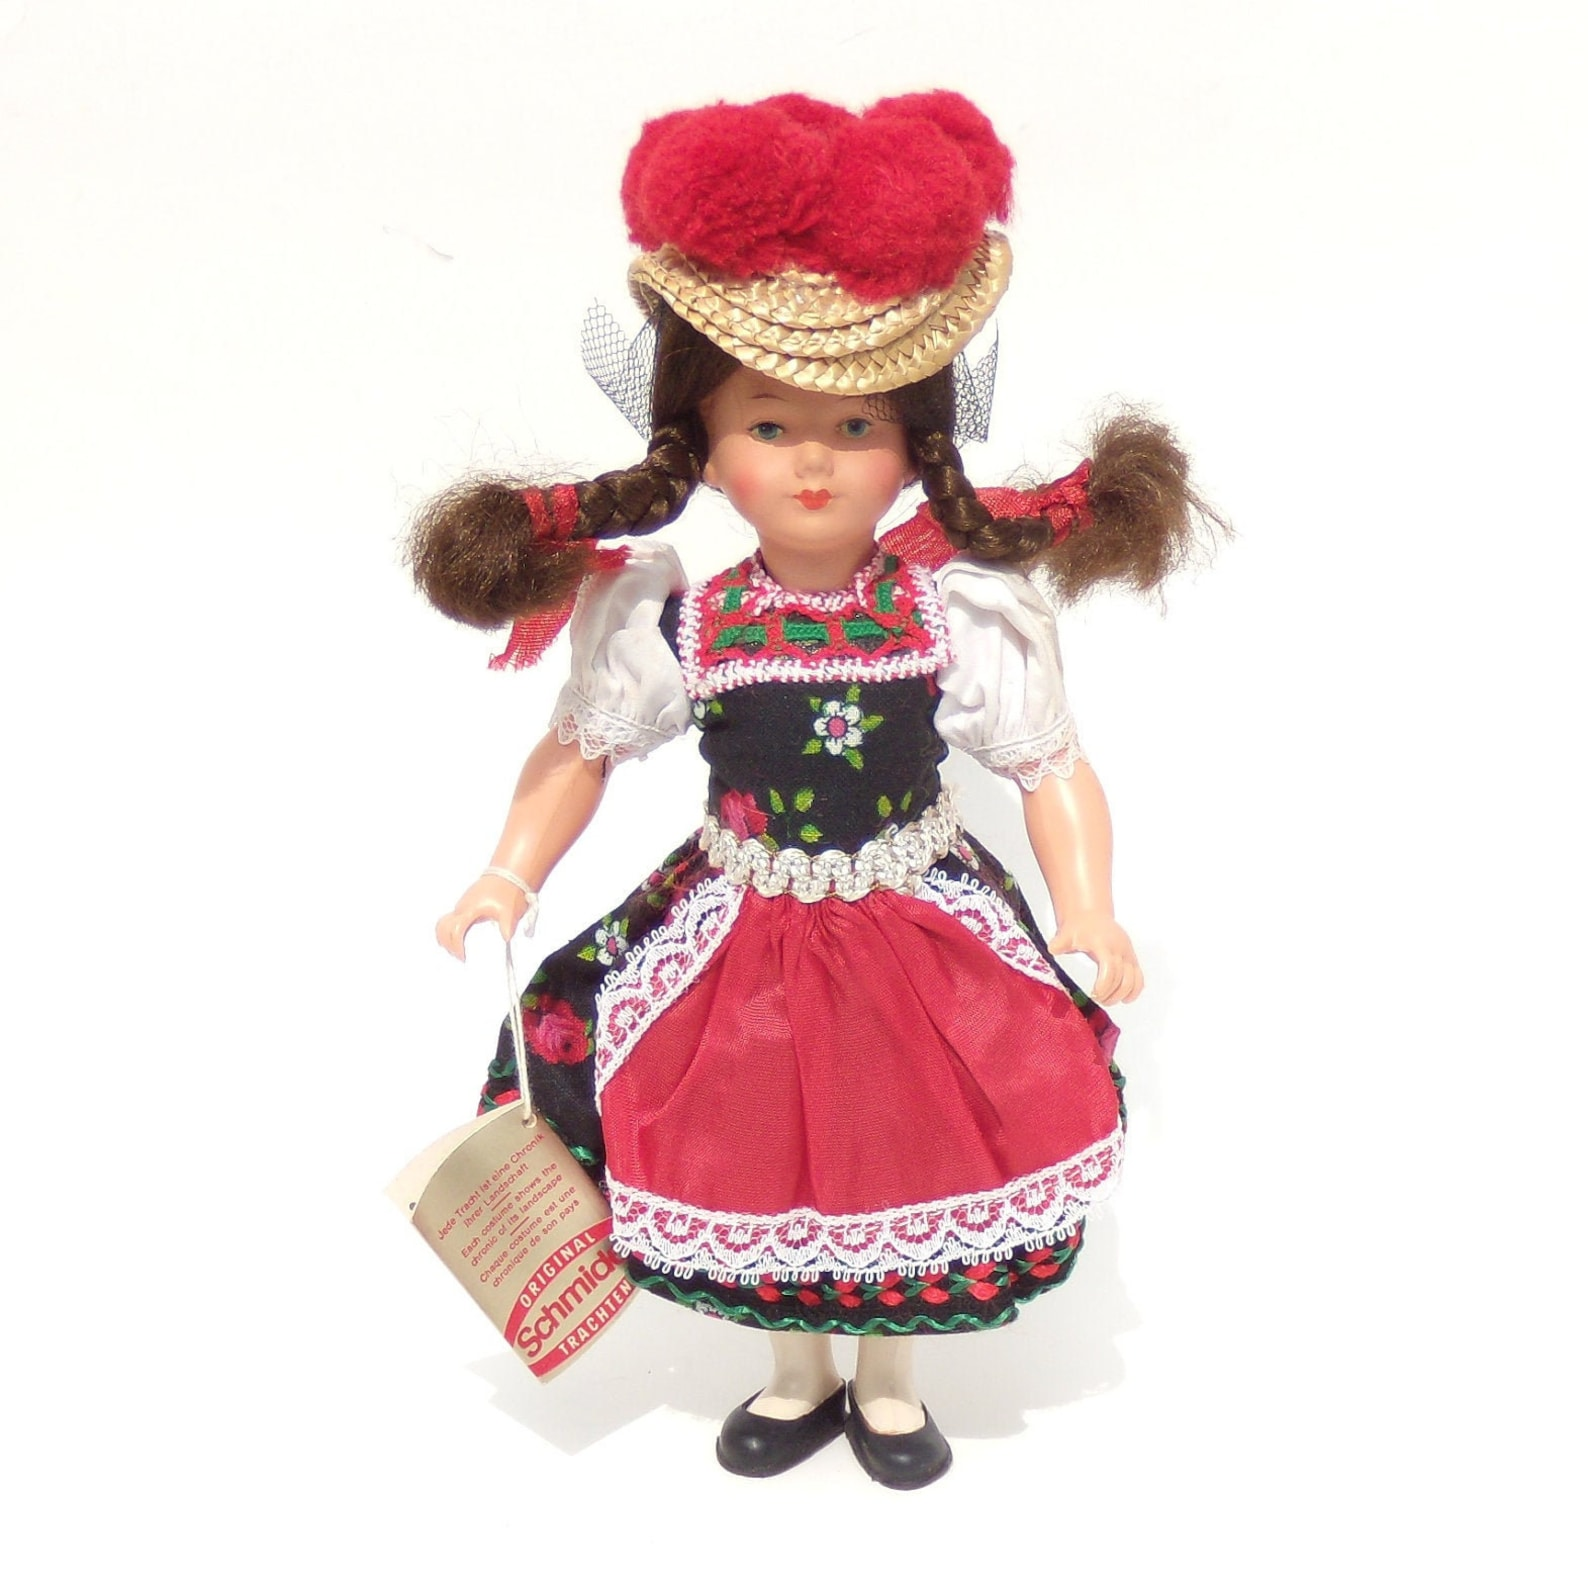 Schmider German Folk Doll, Gutach Schwarzwald Doll